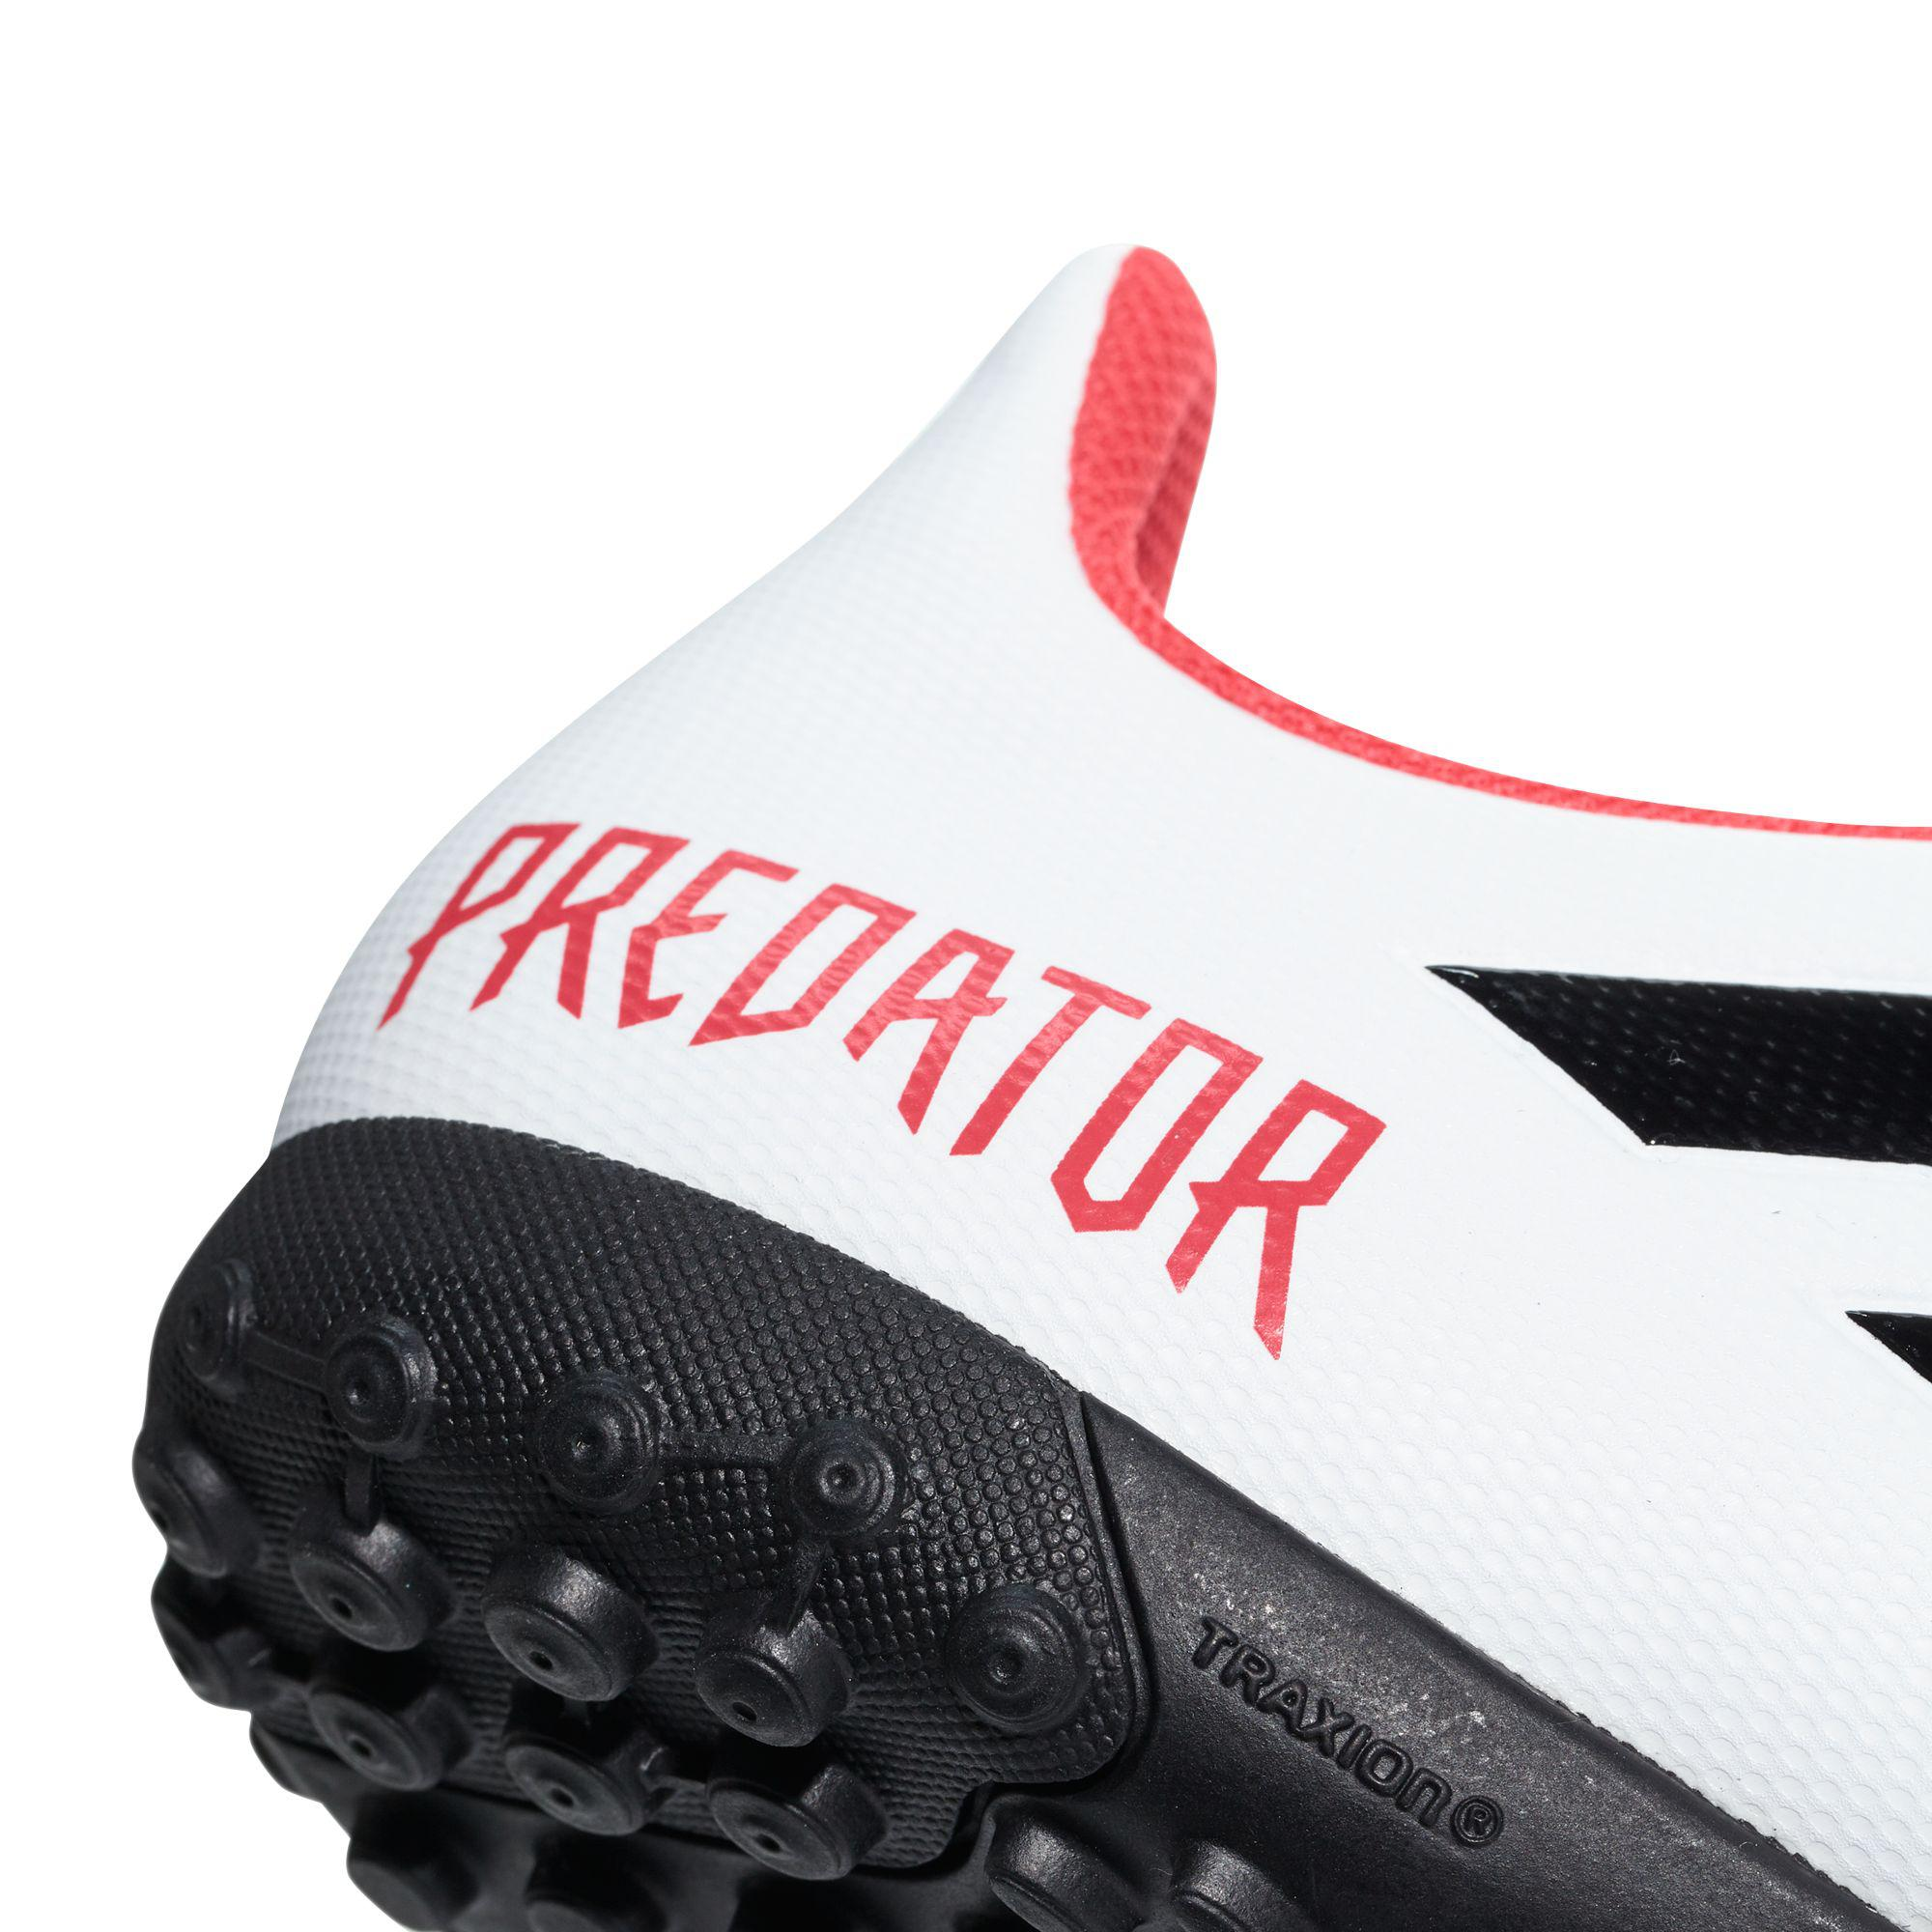 d47924742 adidas Predator Tango 18.4 Men's Artificial Turf Football Shoes in ...